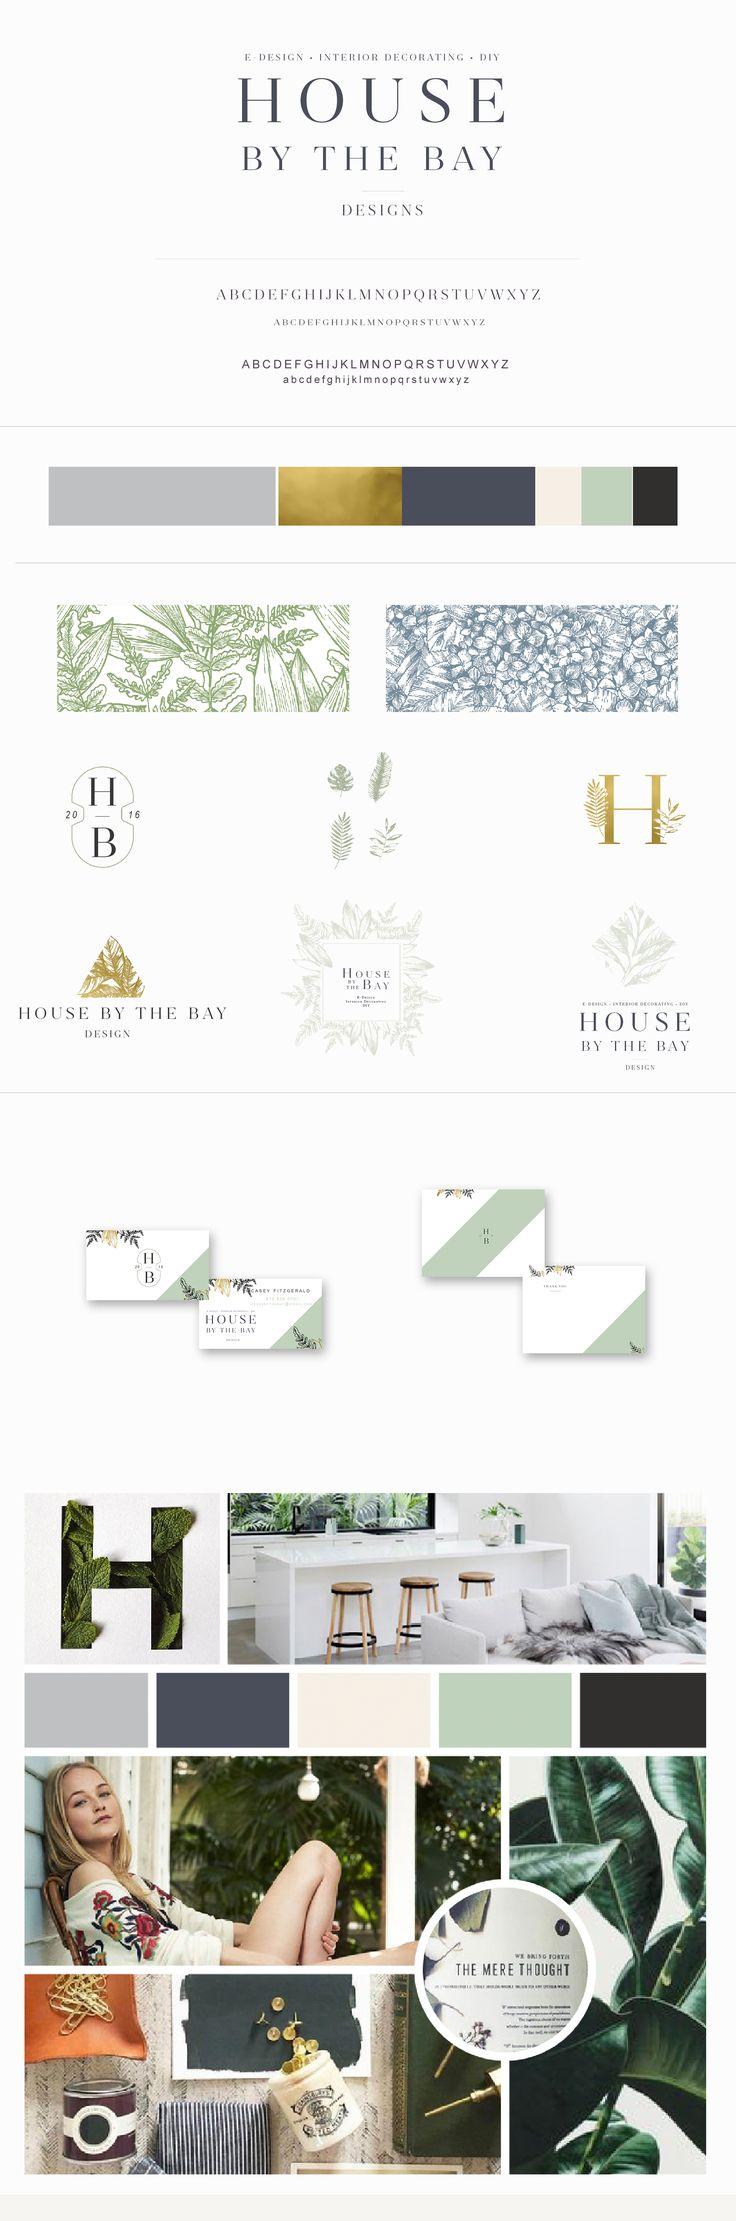 House by the Bay Brand Design by Harper Maven Design \\ www.harpermavendesign.com